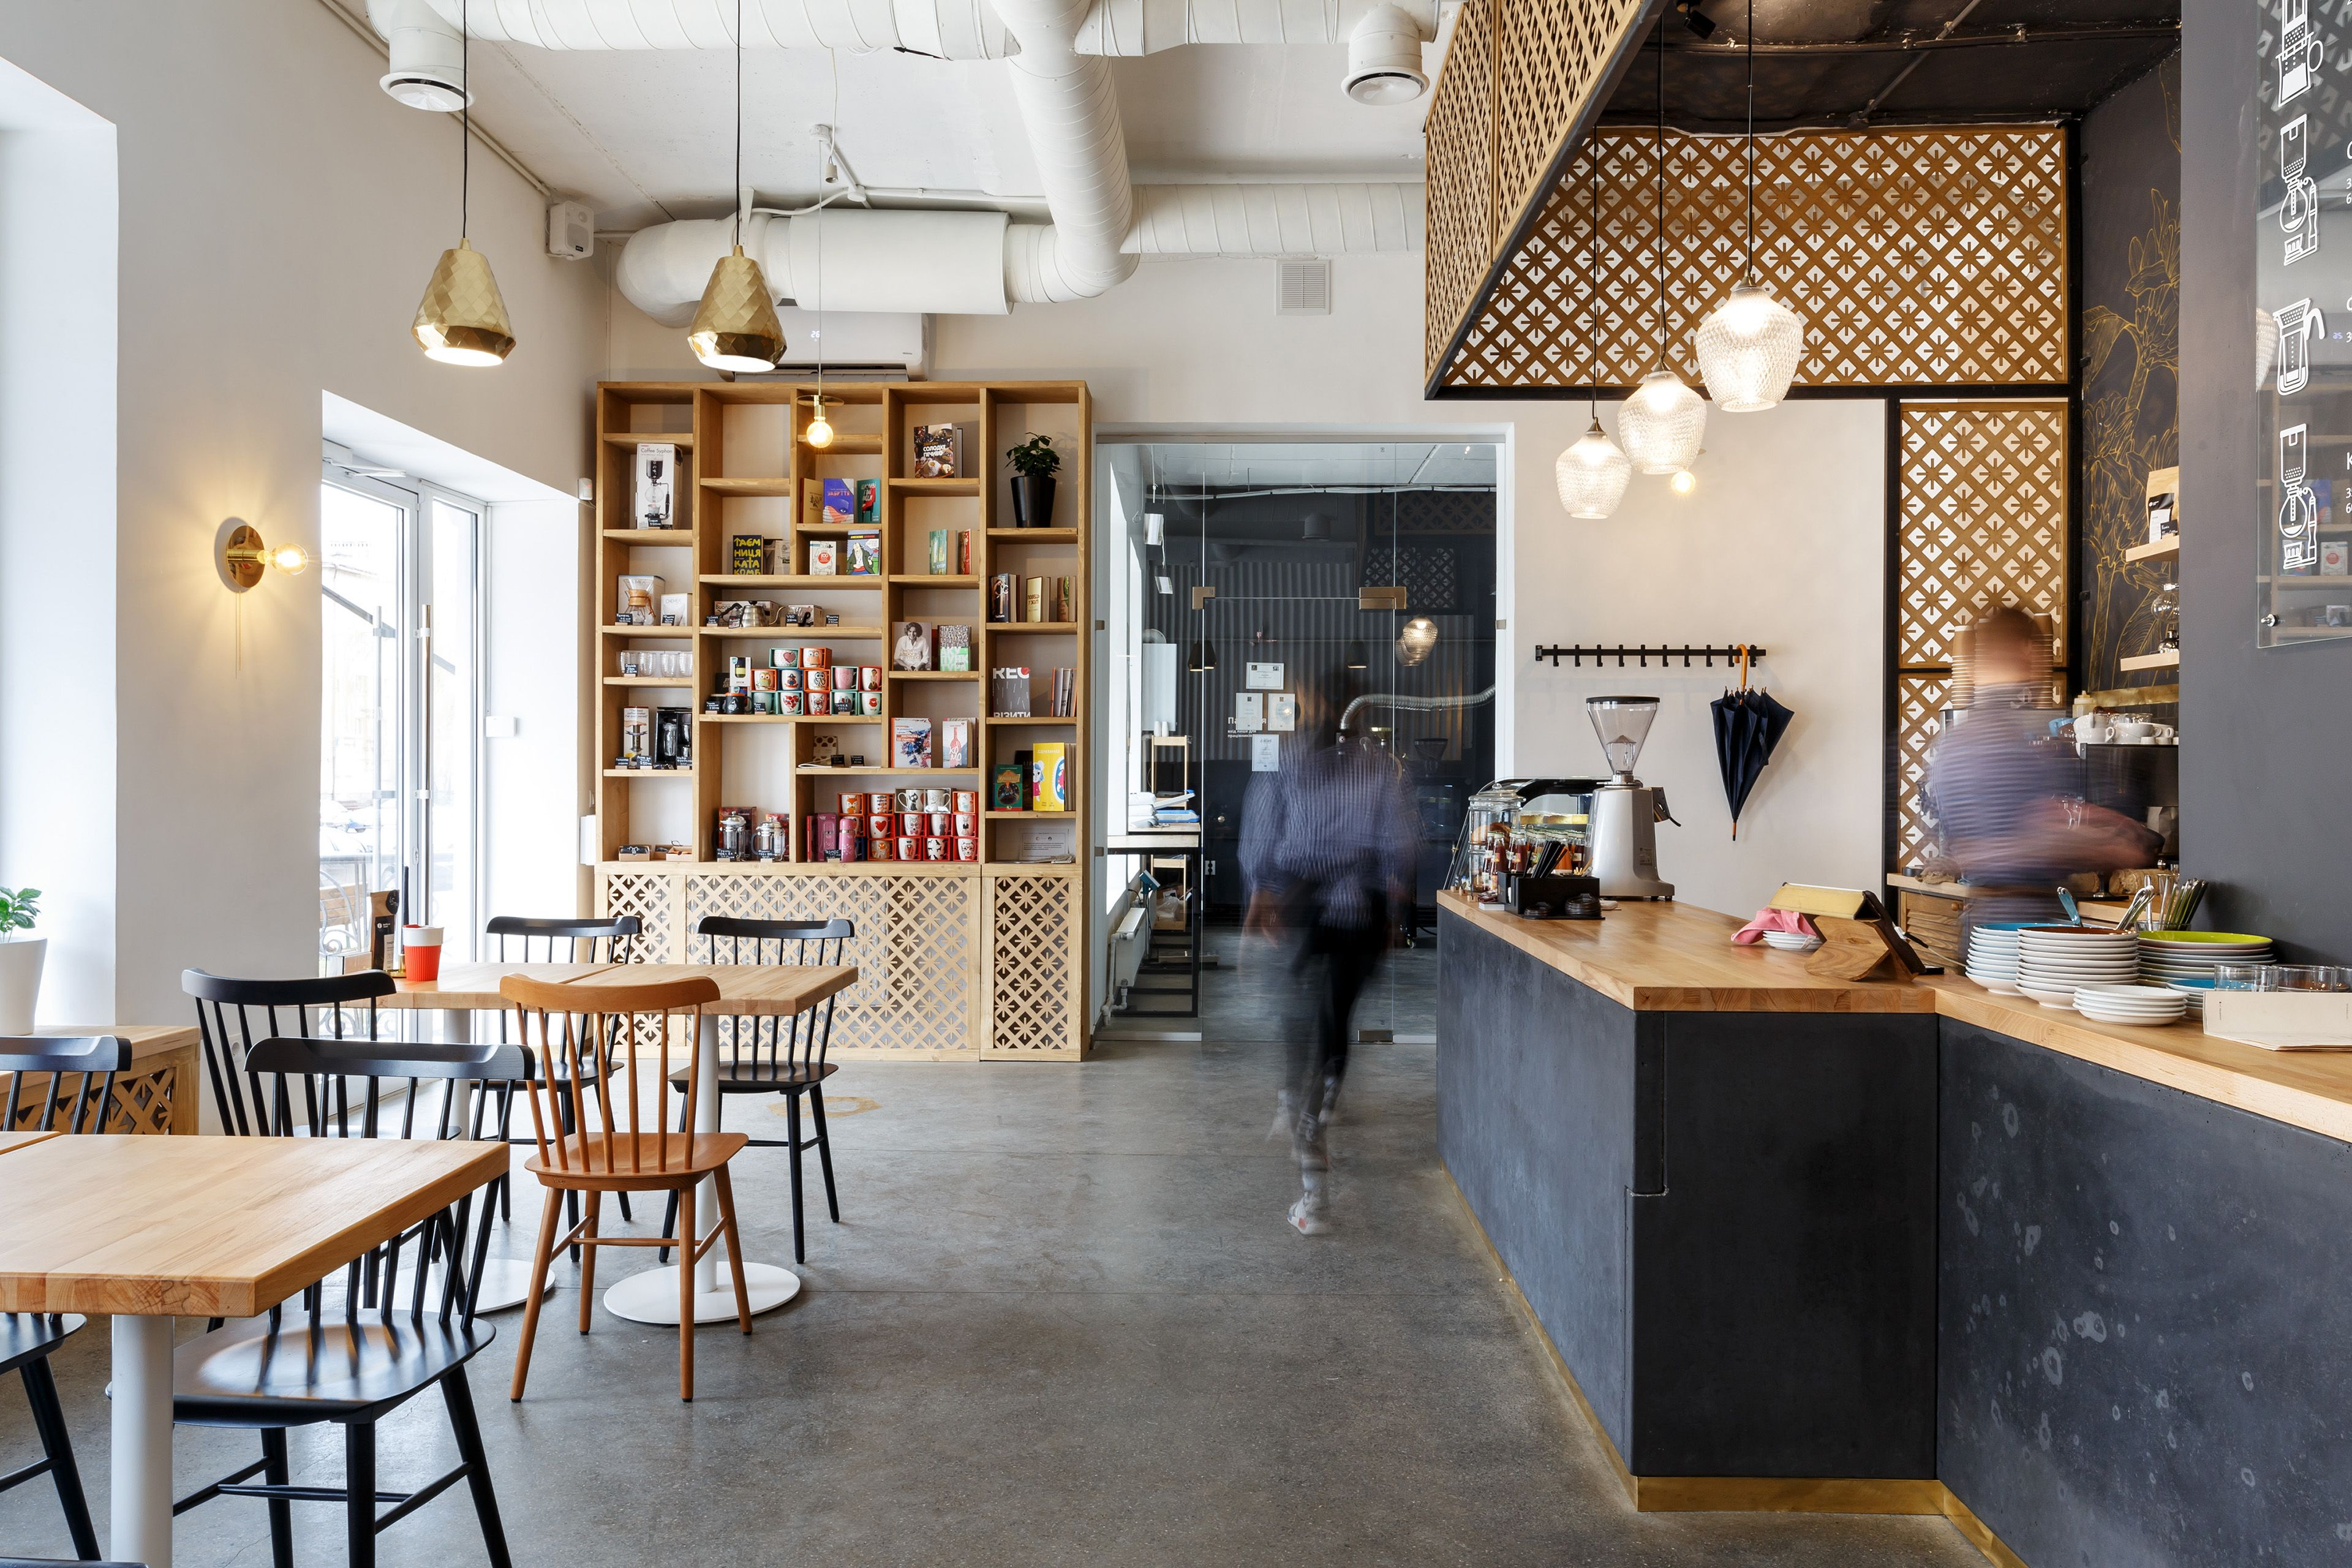 Fabryka Kavy coffee shop on Behance